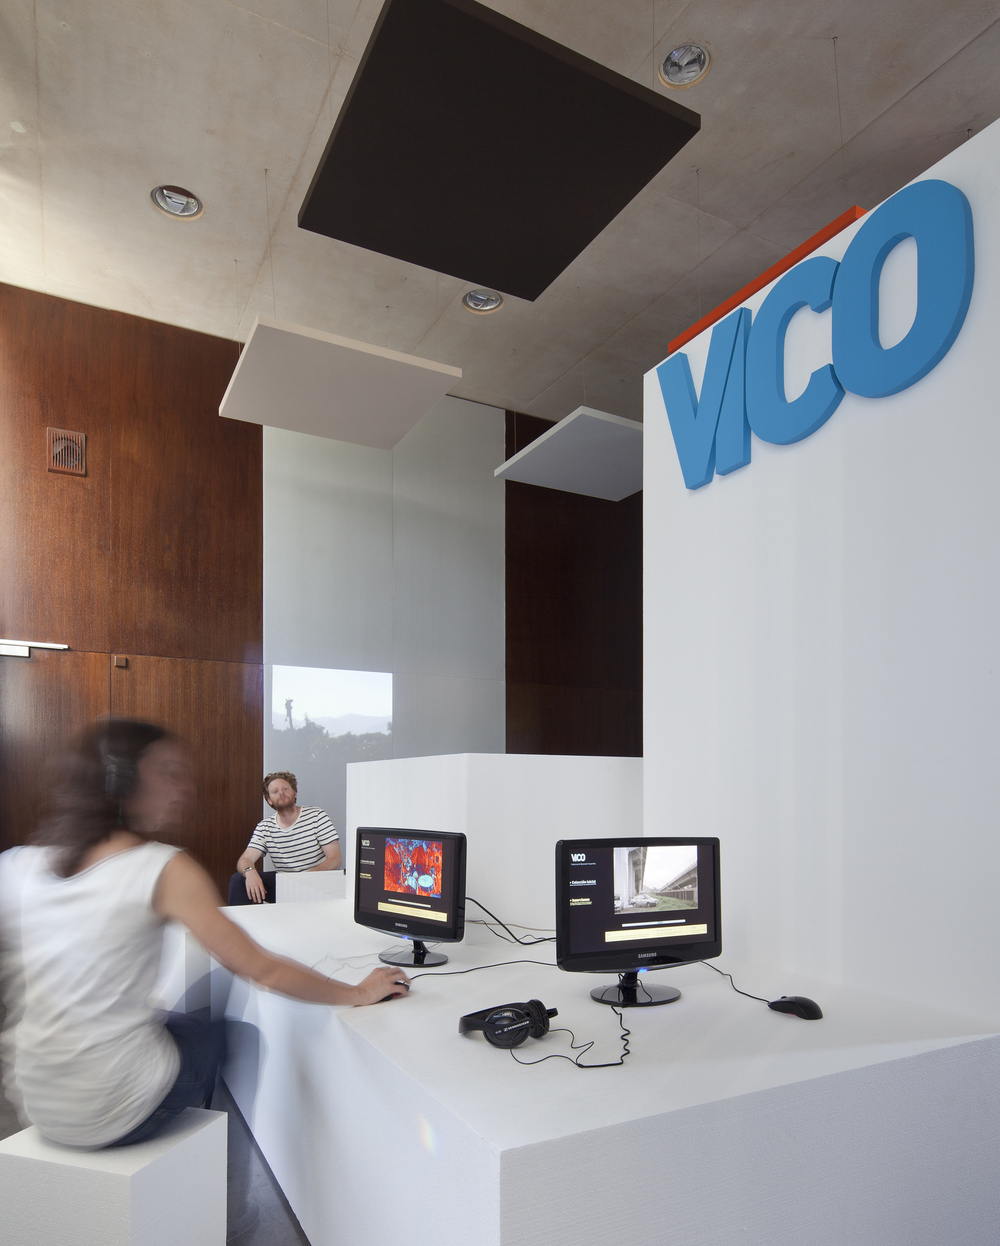 VICO_002.jpg